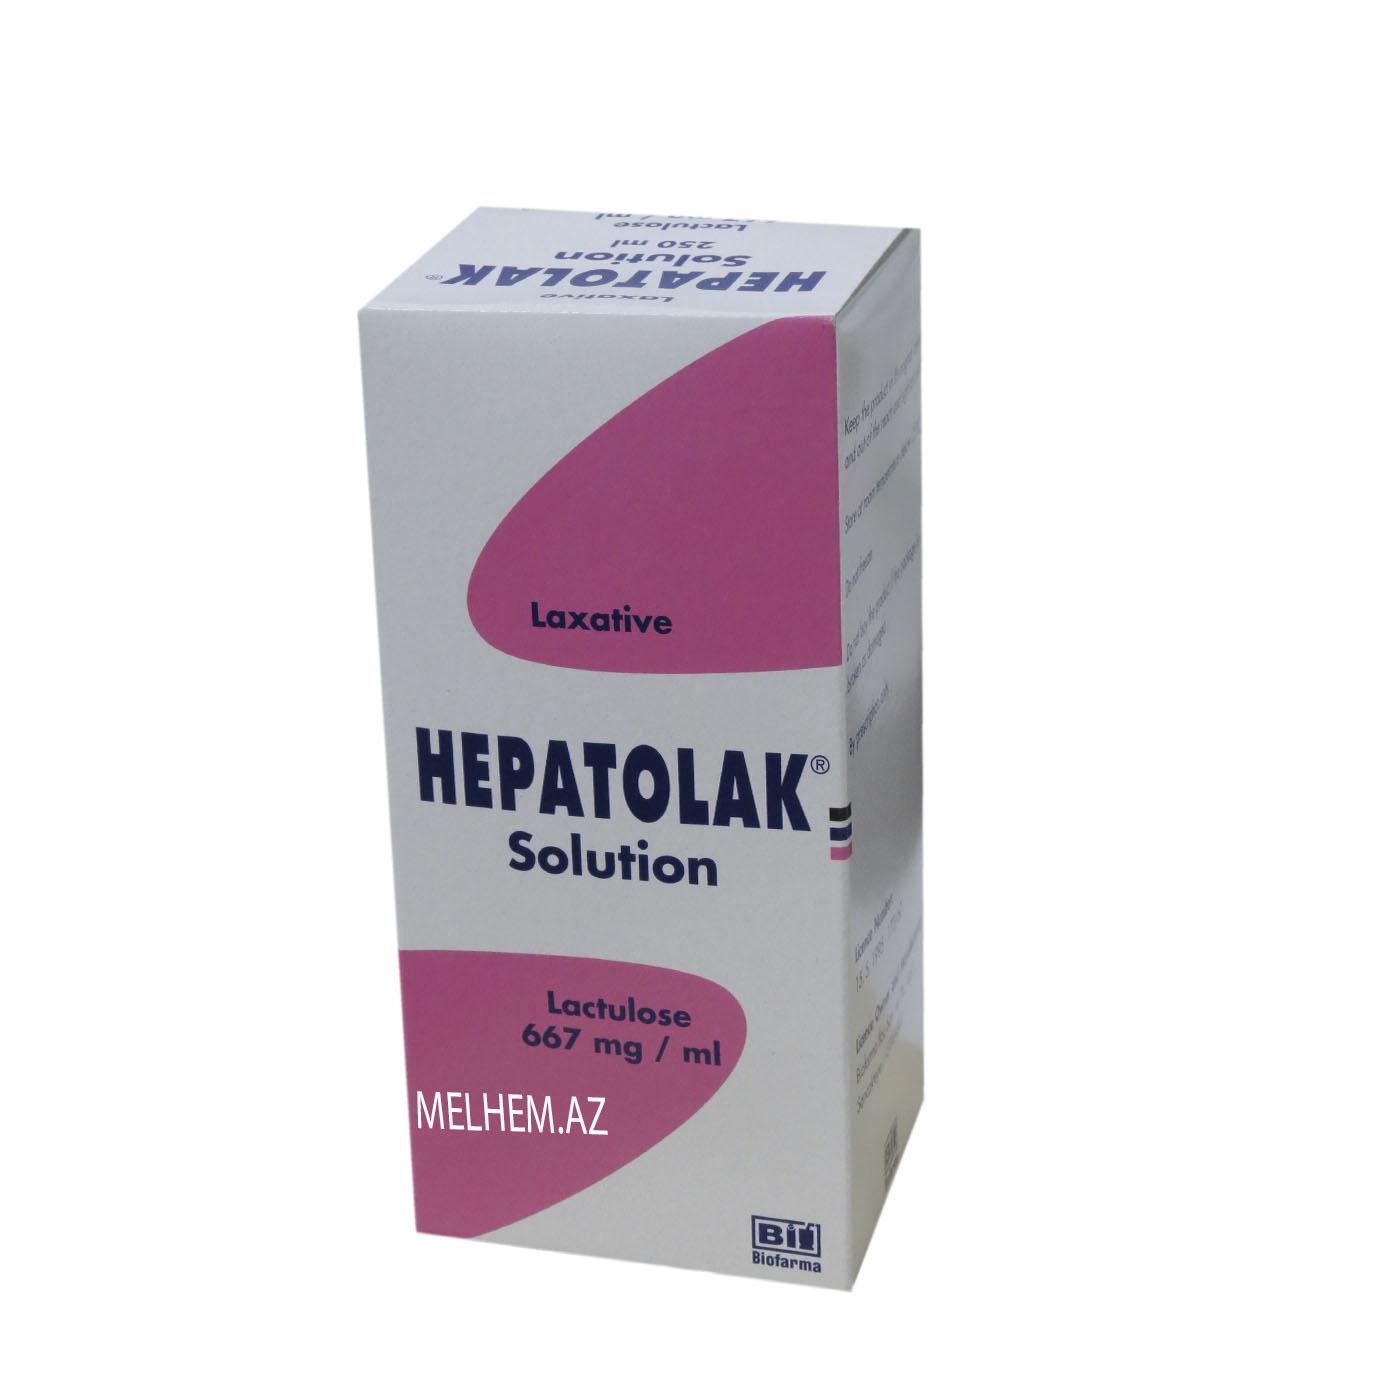 HEPATOLAK 667MG/ML